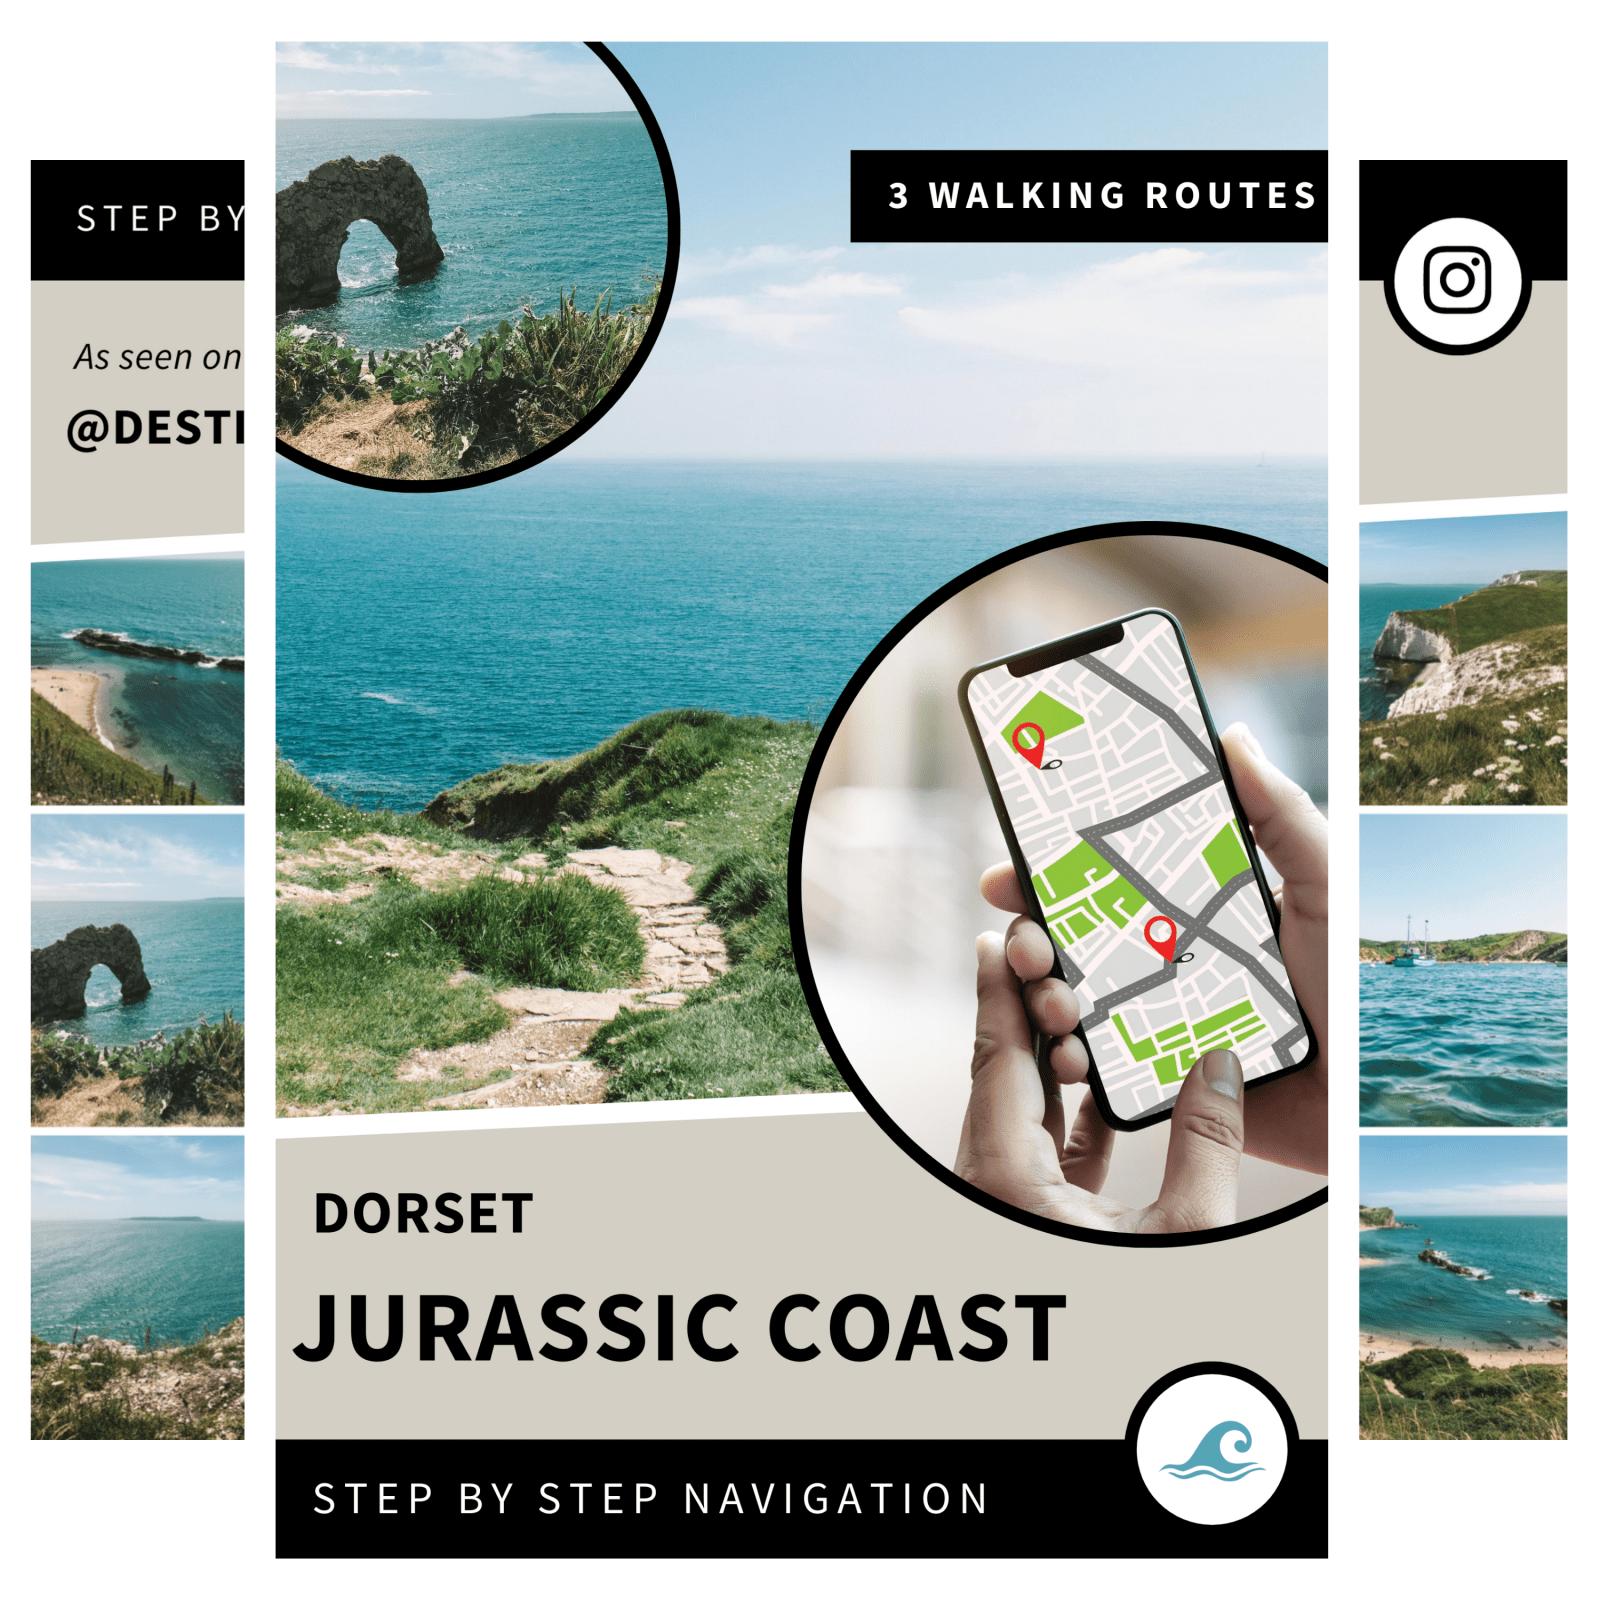 Jurassic Coast walking routes